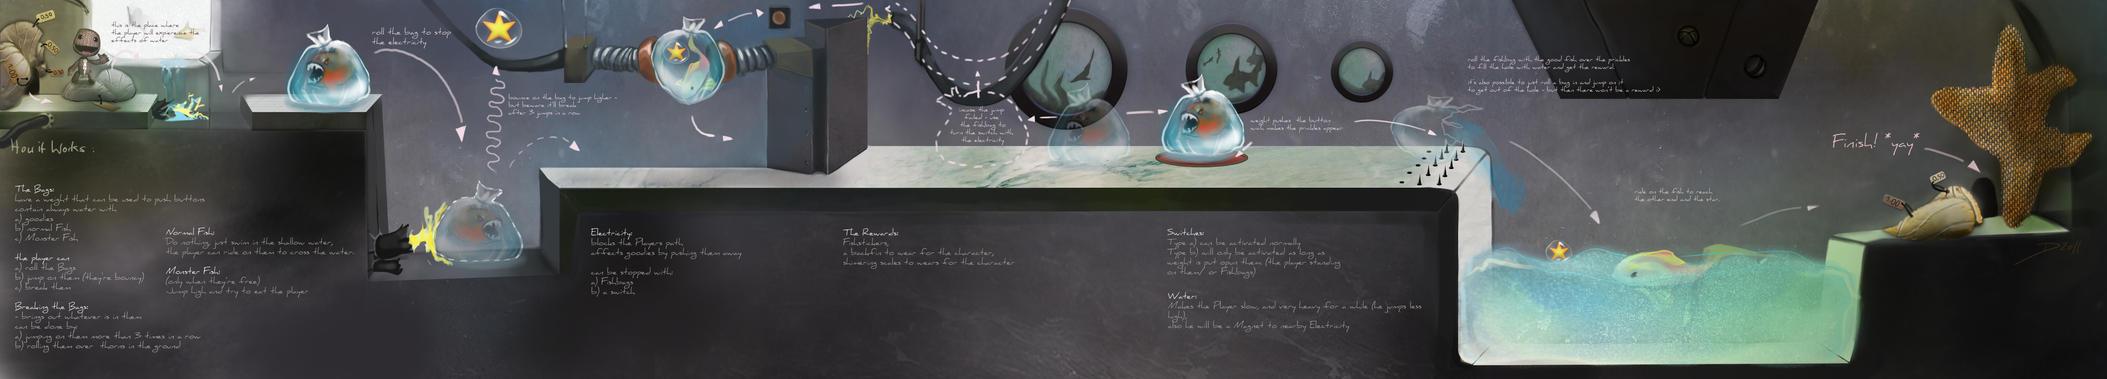 Behind the AquaristikShop by CheezyCat